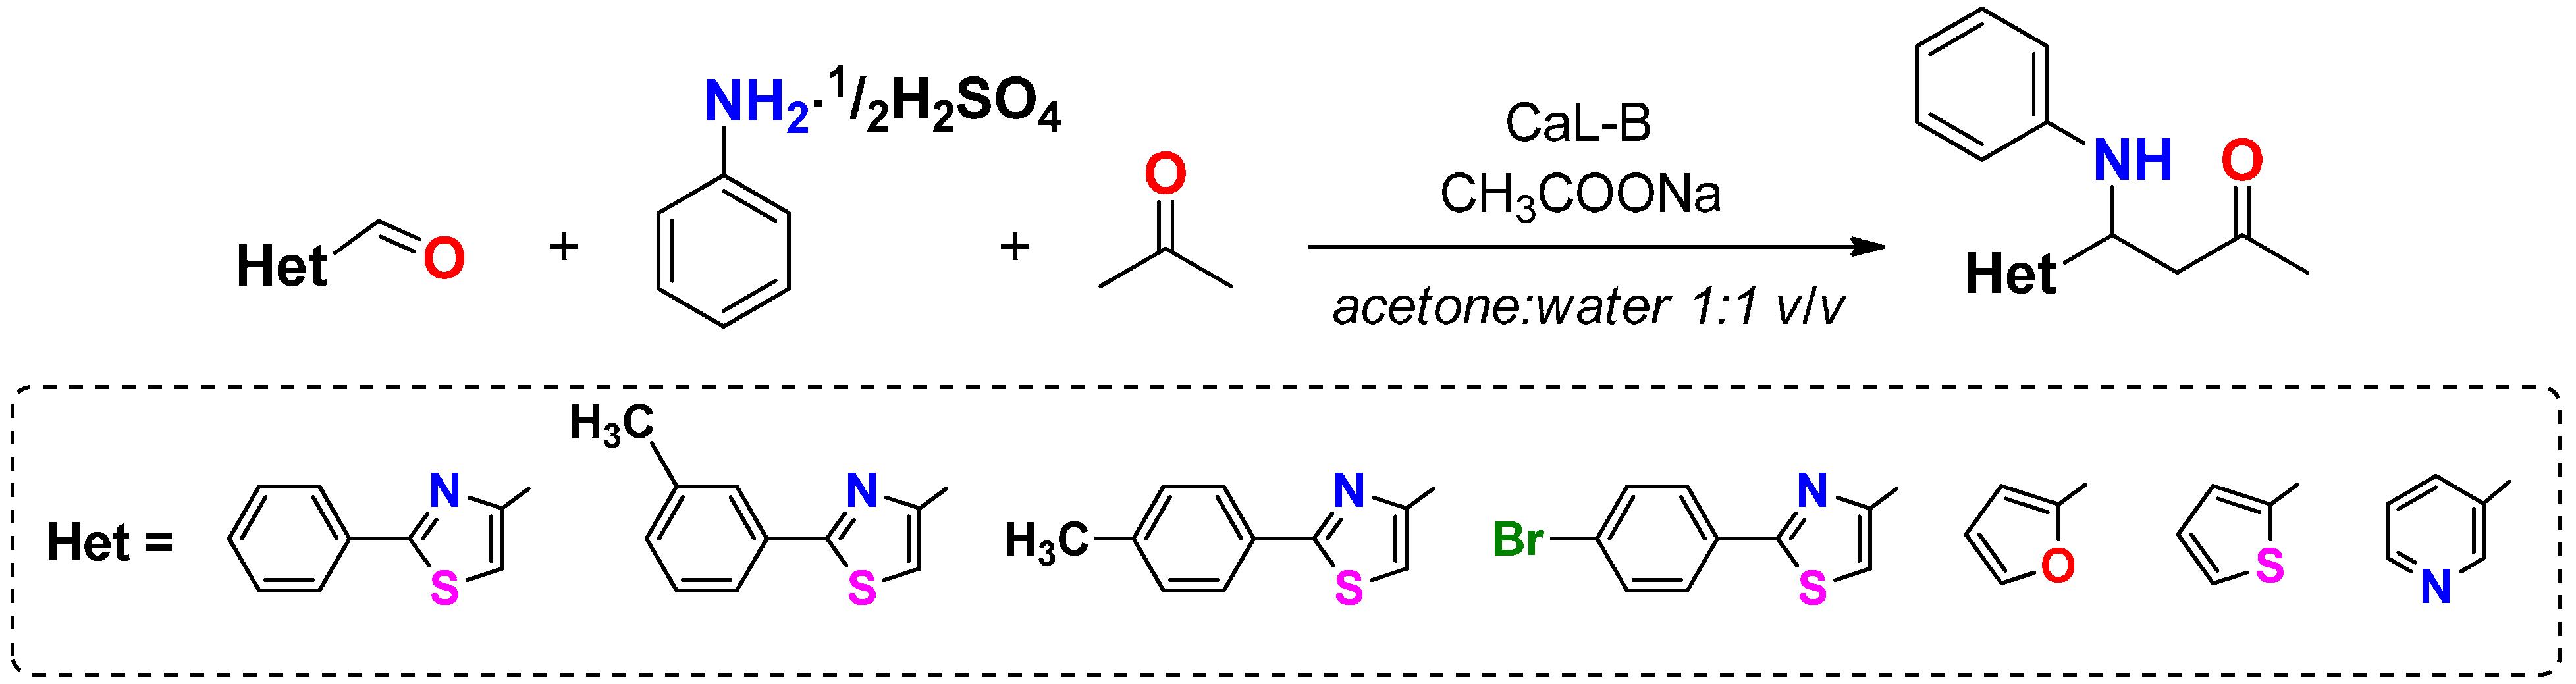 Chemistry, Ph.D.